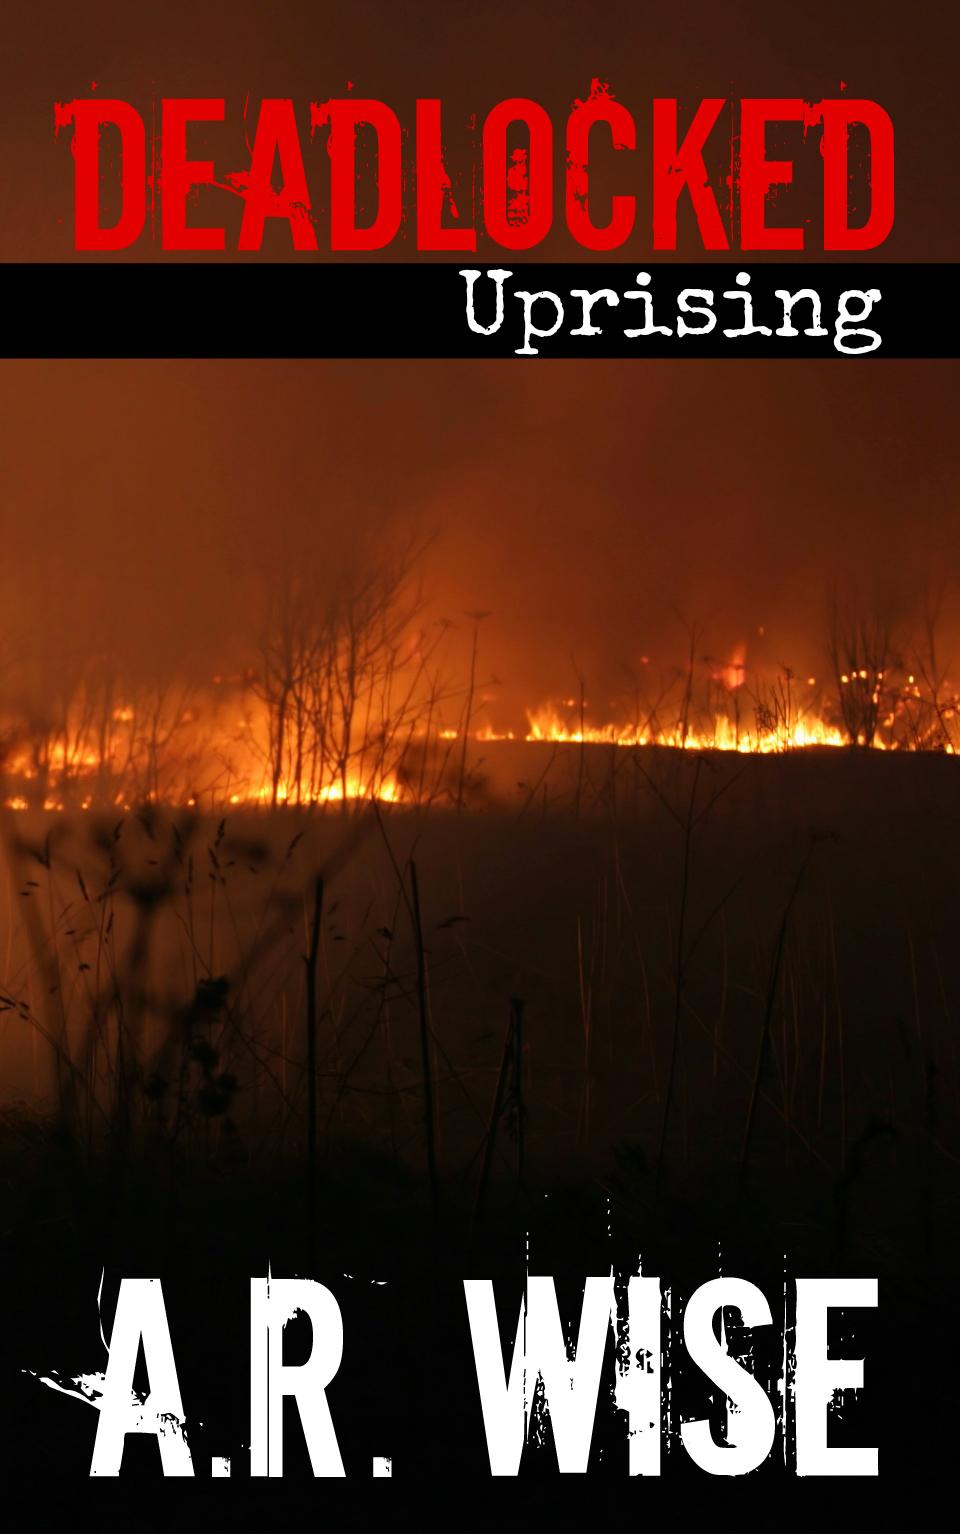 Deadlocked 6 Uprising Cover